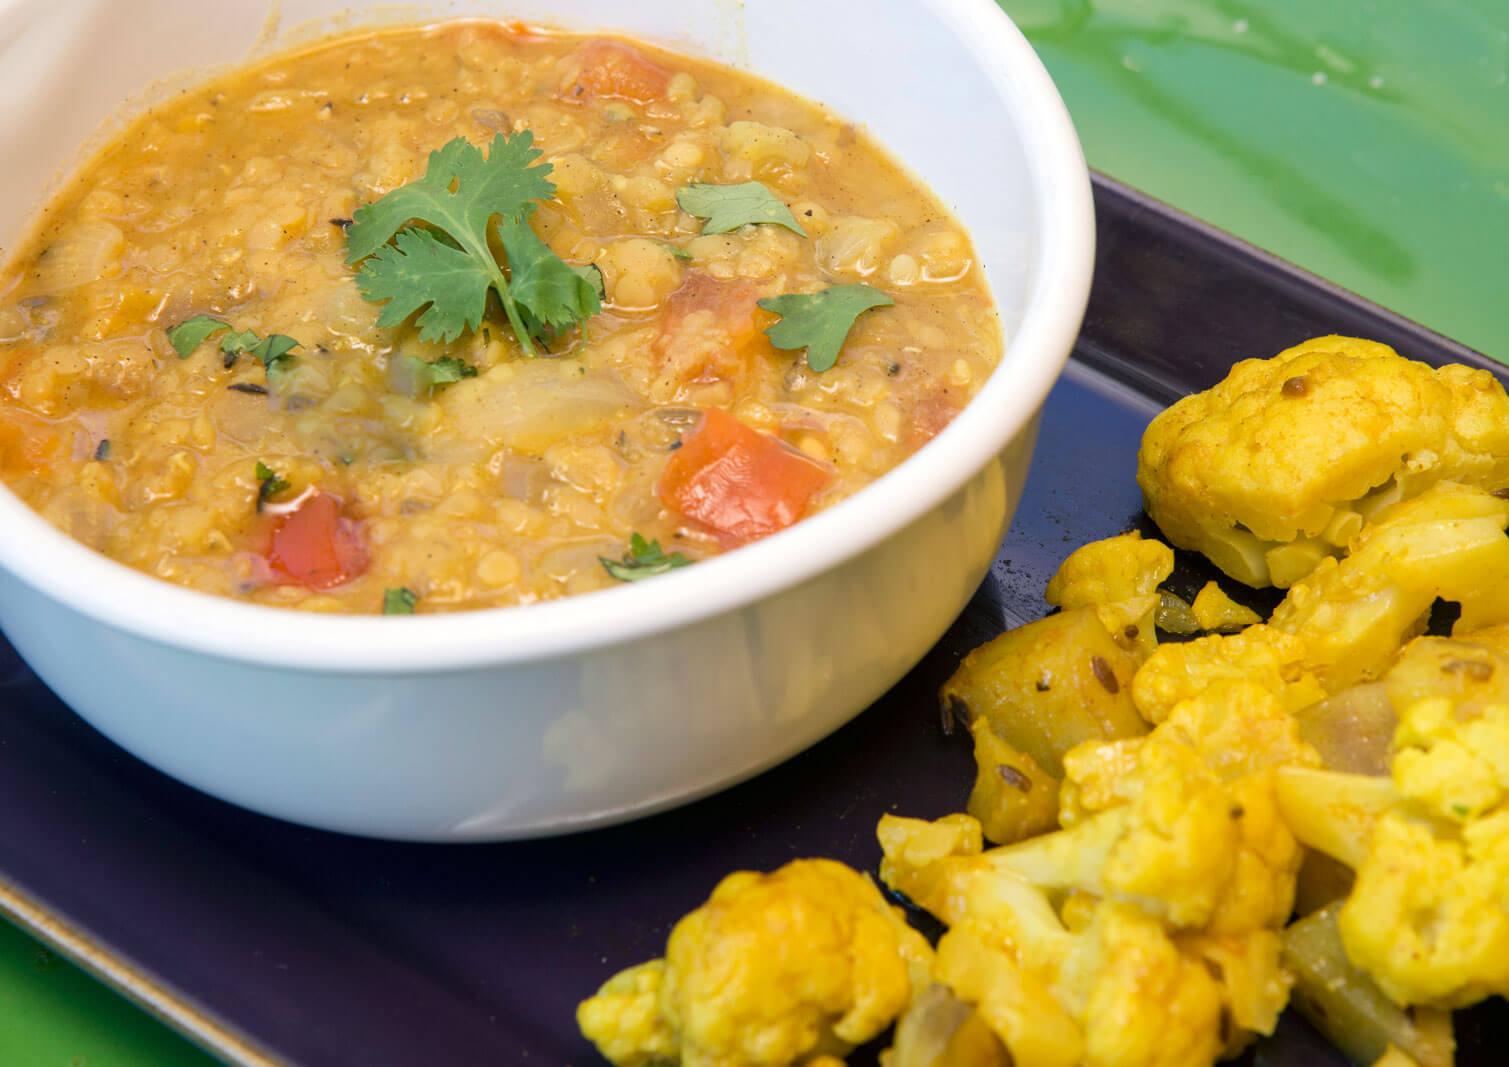 Spiced Indian Lentils